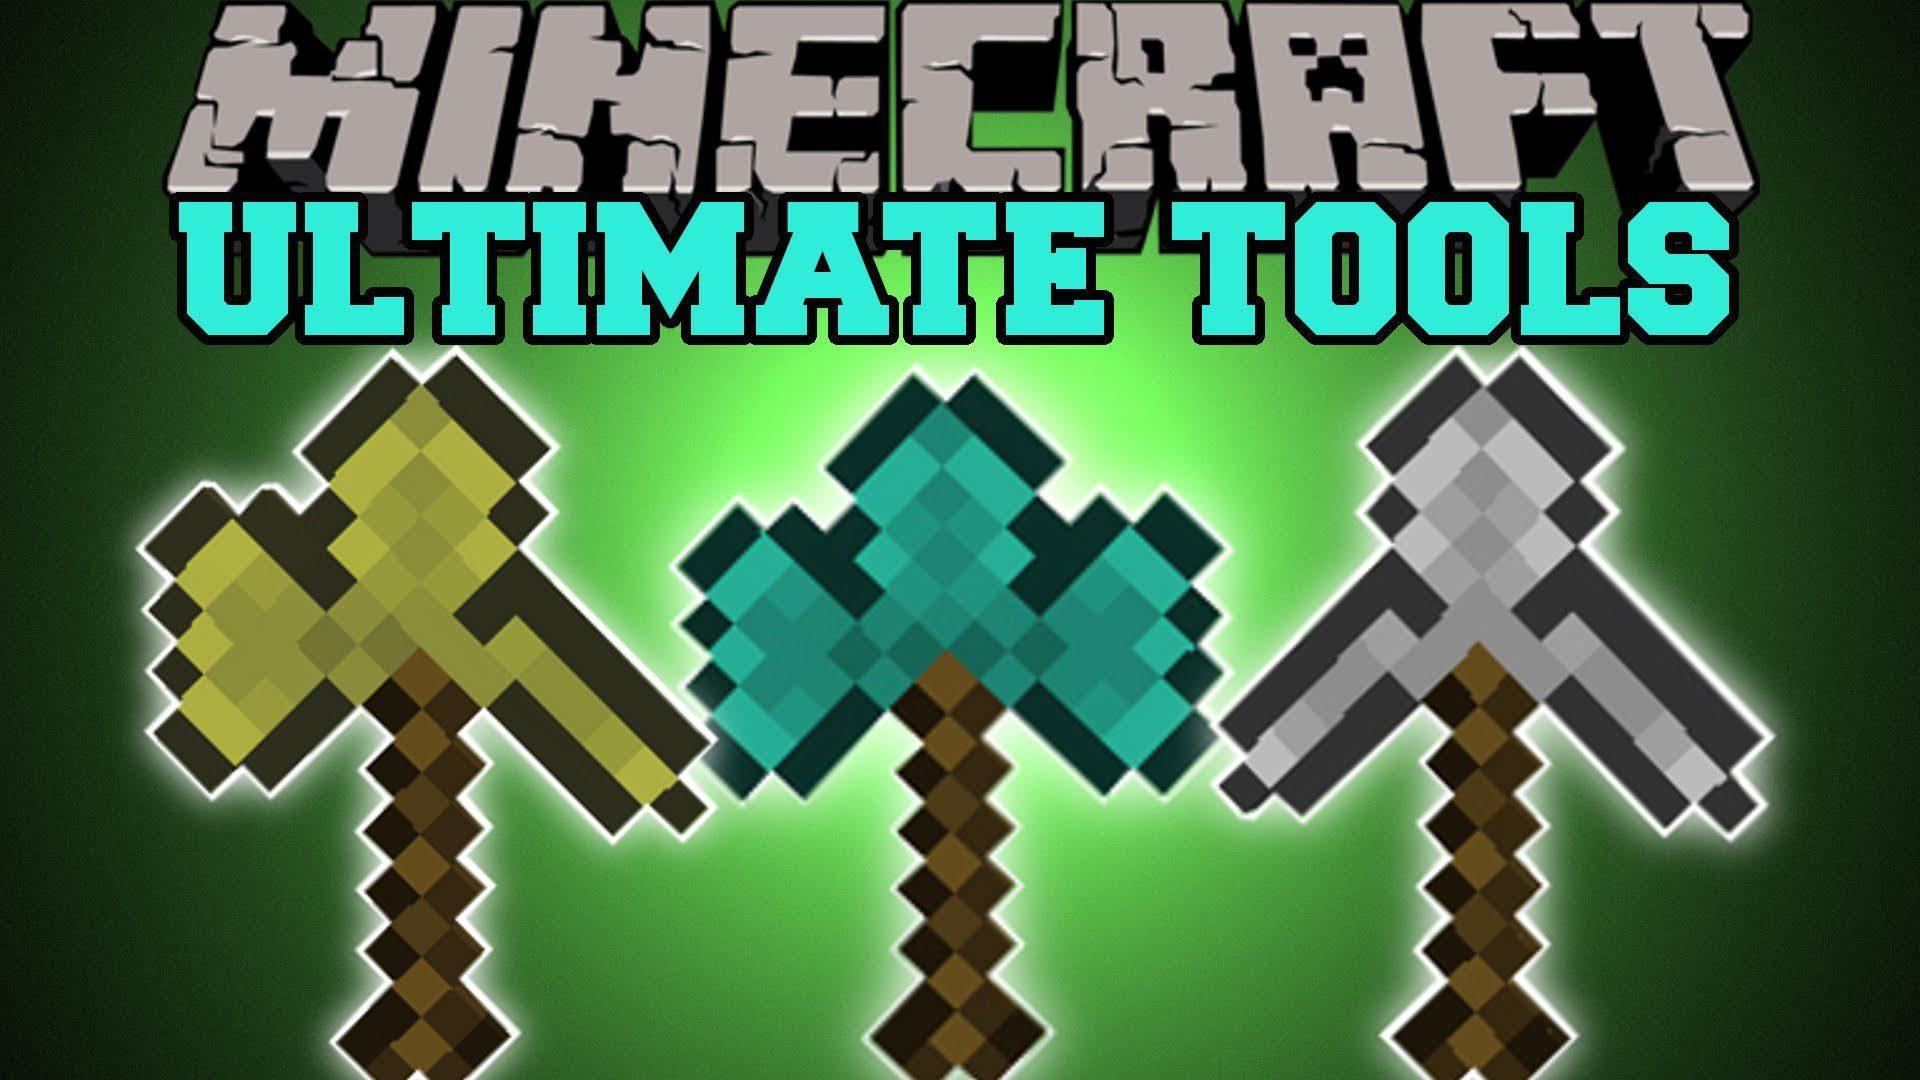 Tools Combine Mod 9.99.9/9.90.9 (Ultimate Tools) - 9Minecraft.Net